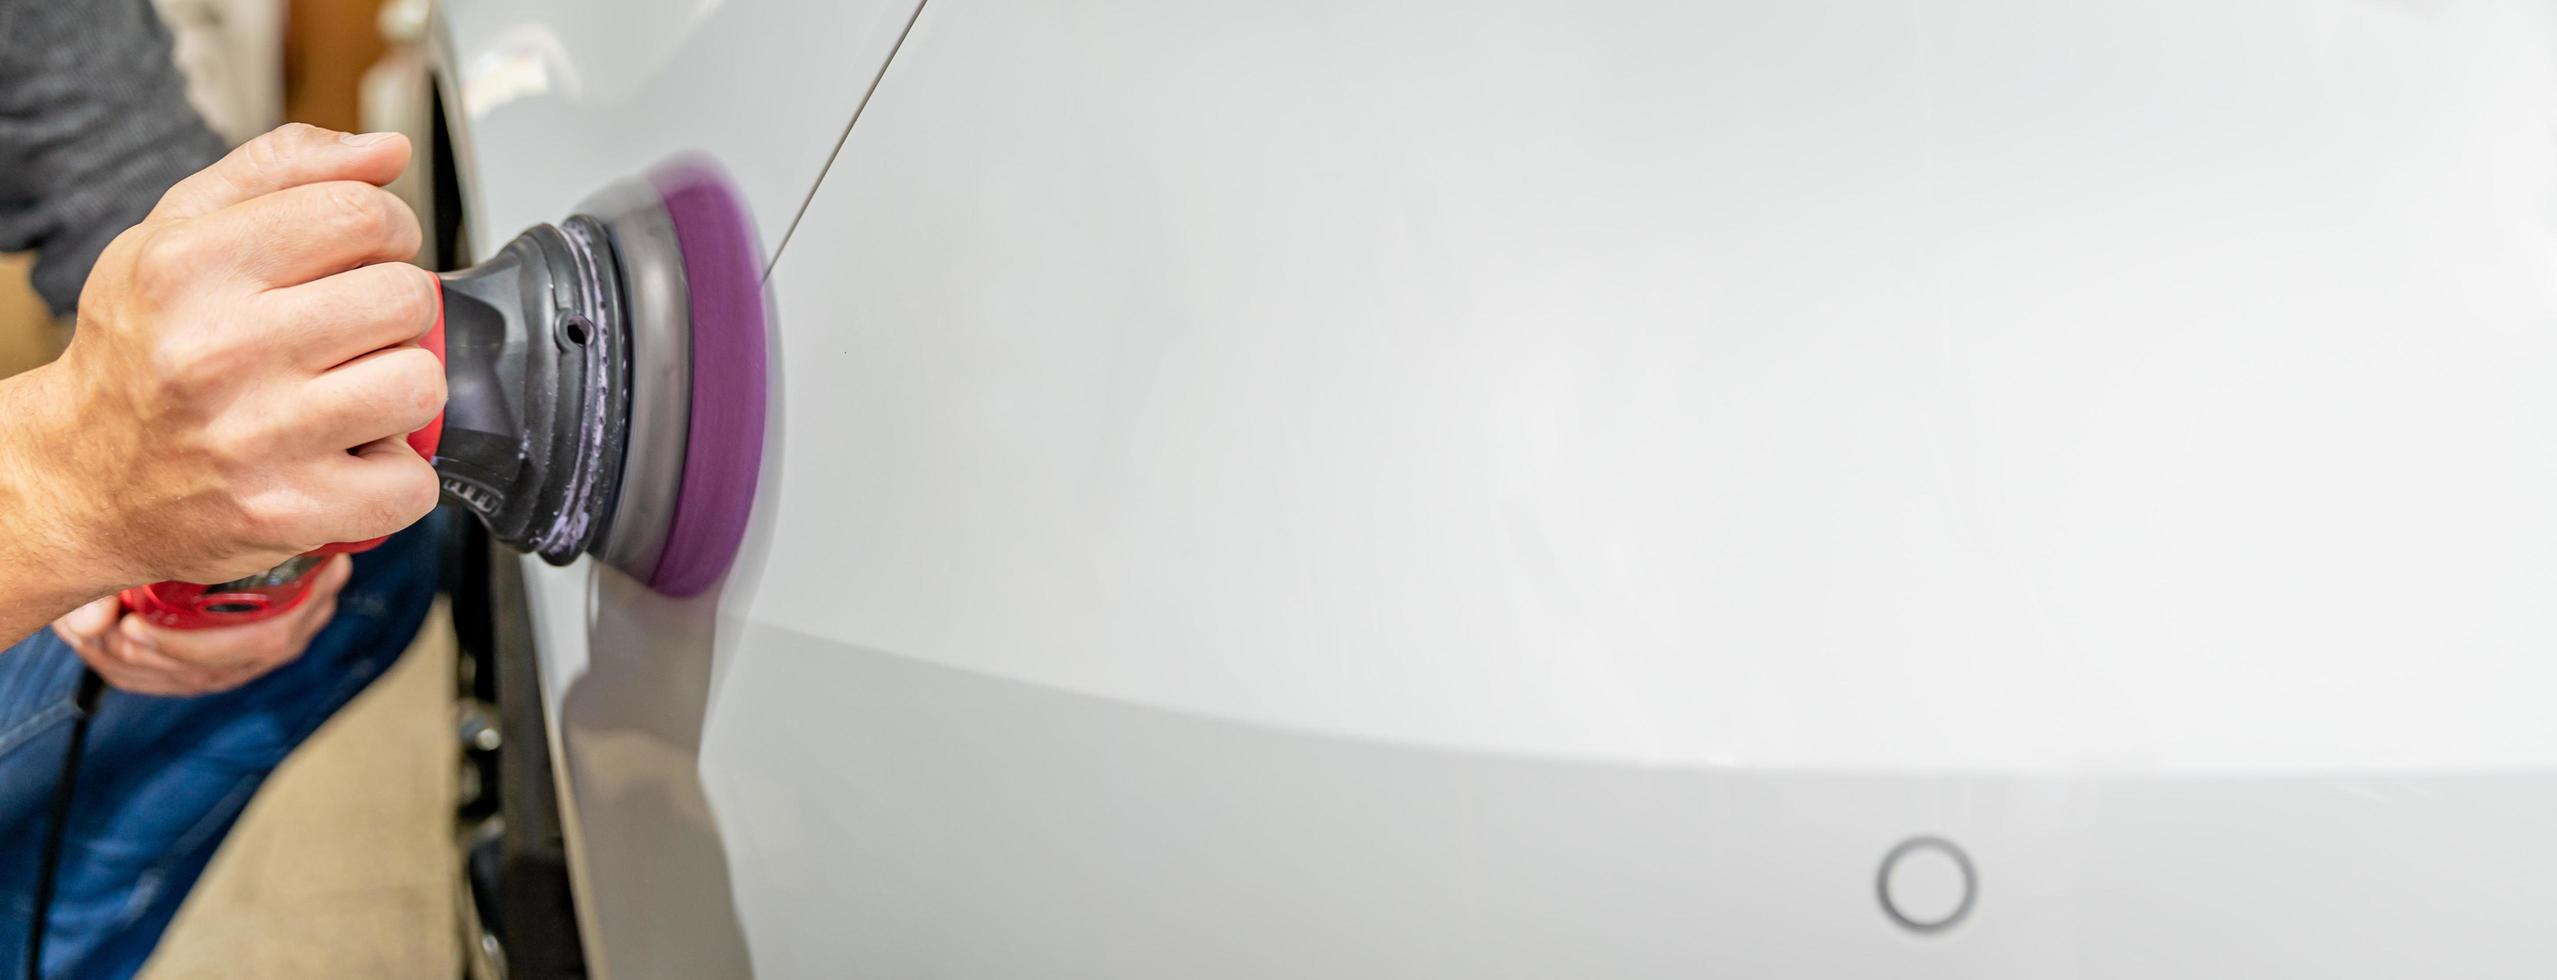 Karosserie Reparatur Polieren foto